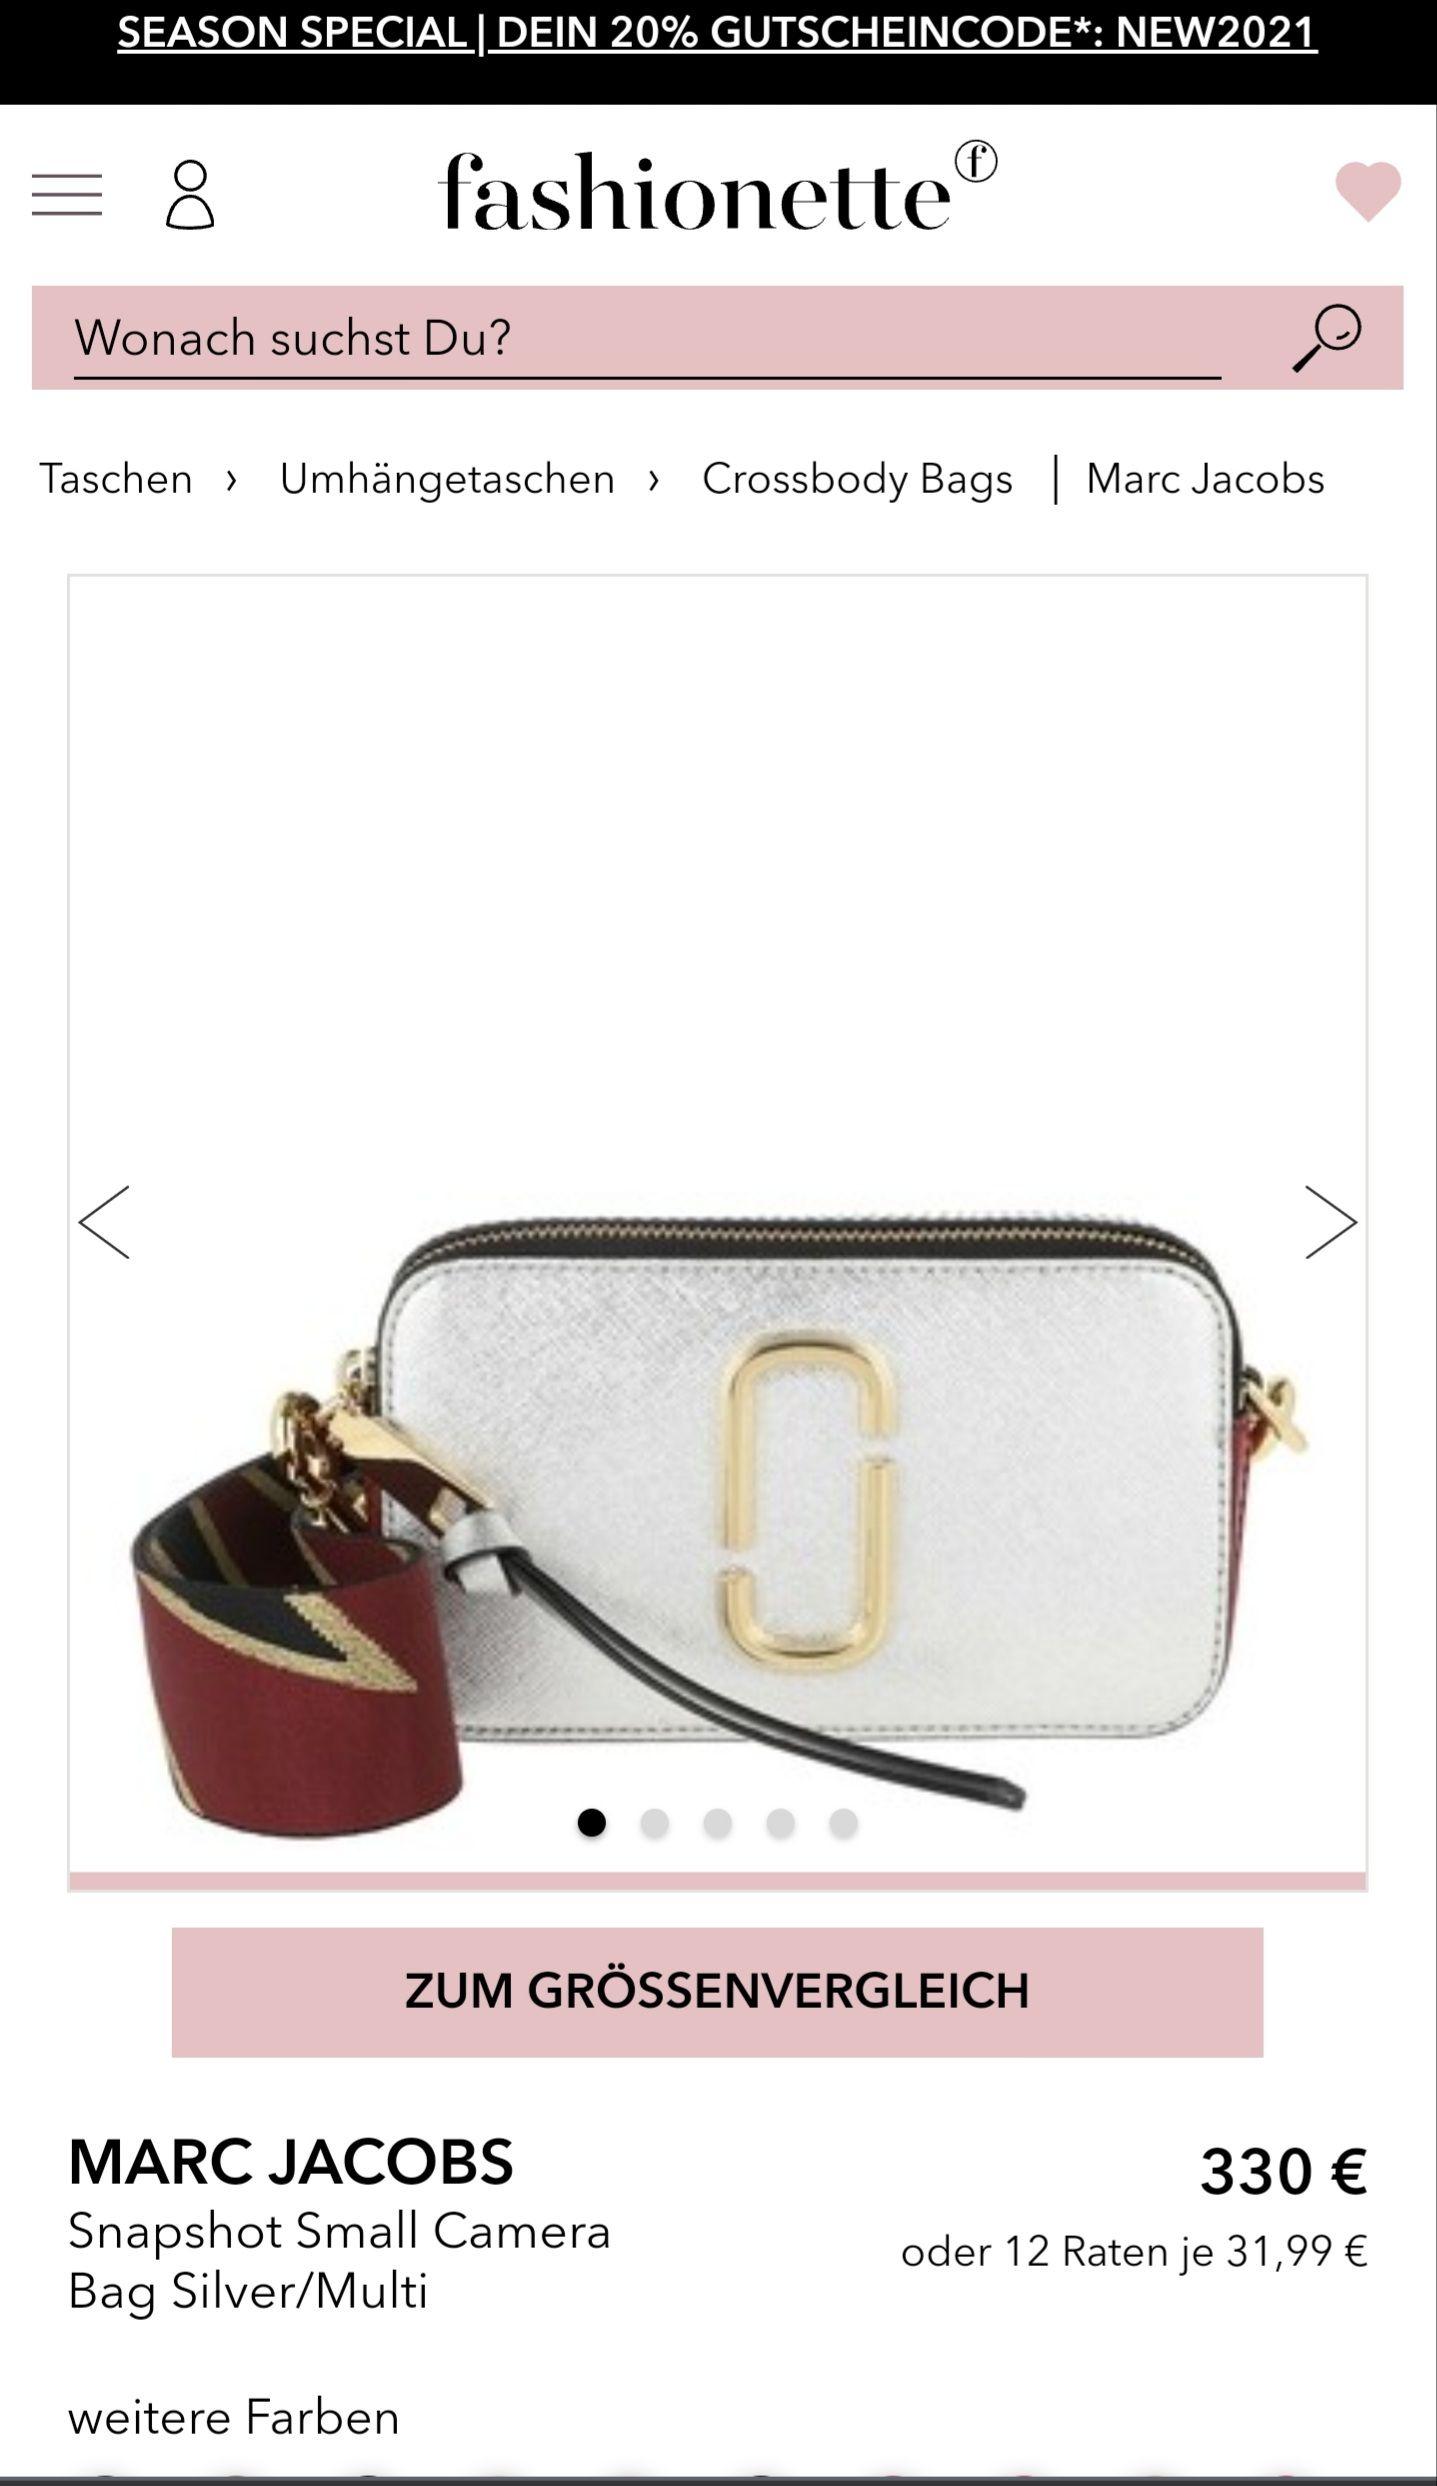 Marc Jacobs Snaphot silber - 20% Rabatt über Fashionette